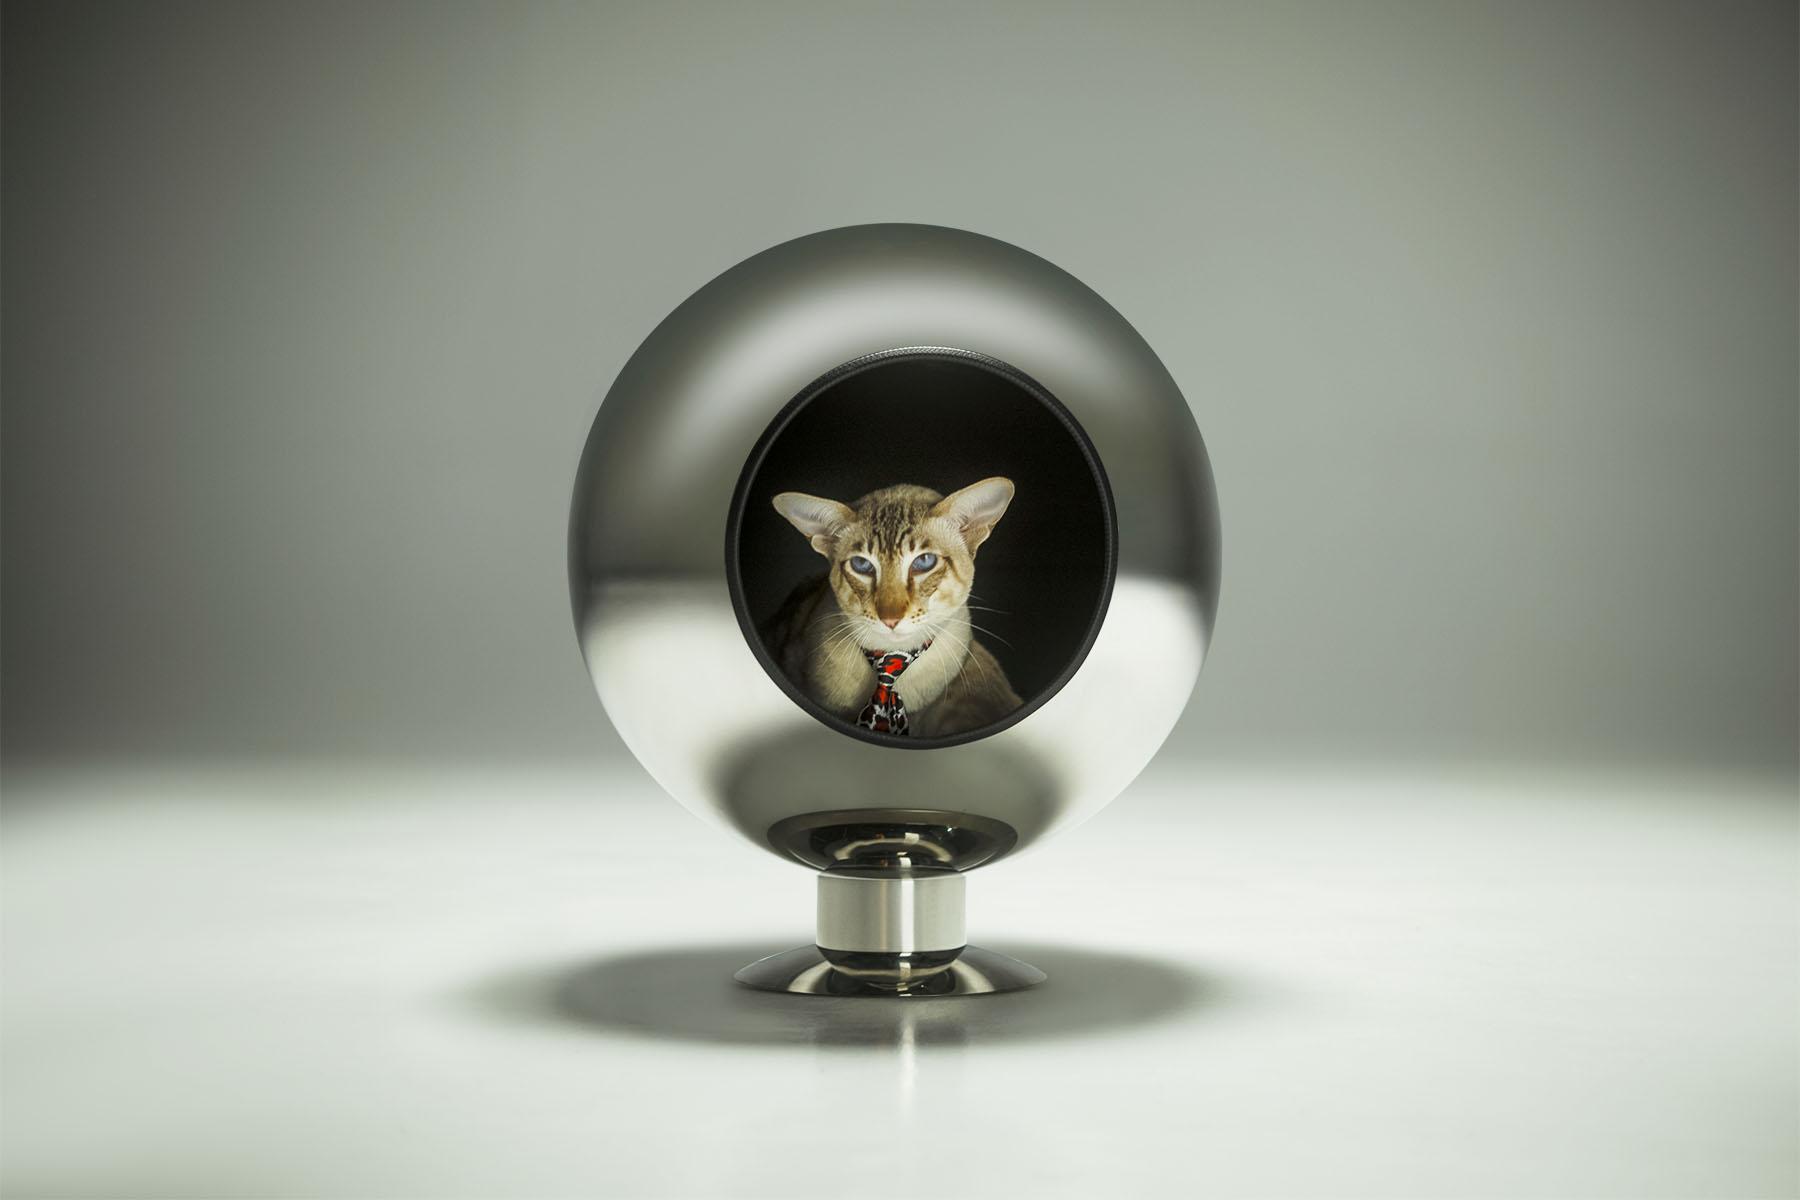 Piranjas Pluto Cat Bed (Variant 1)